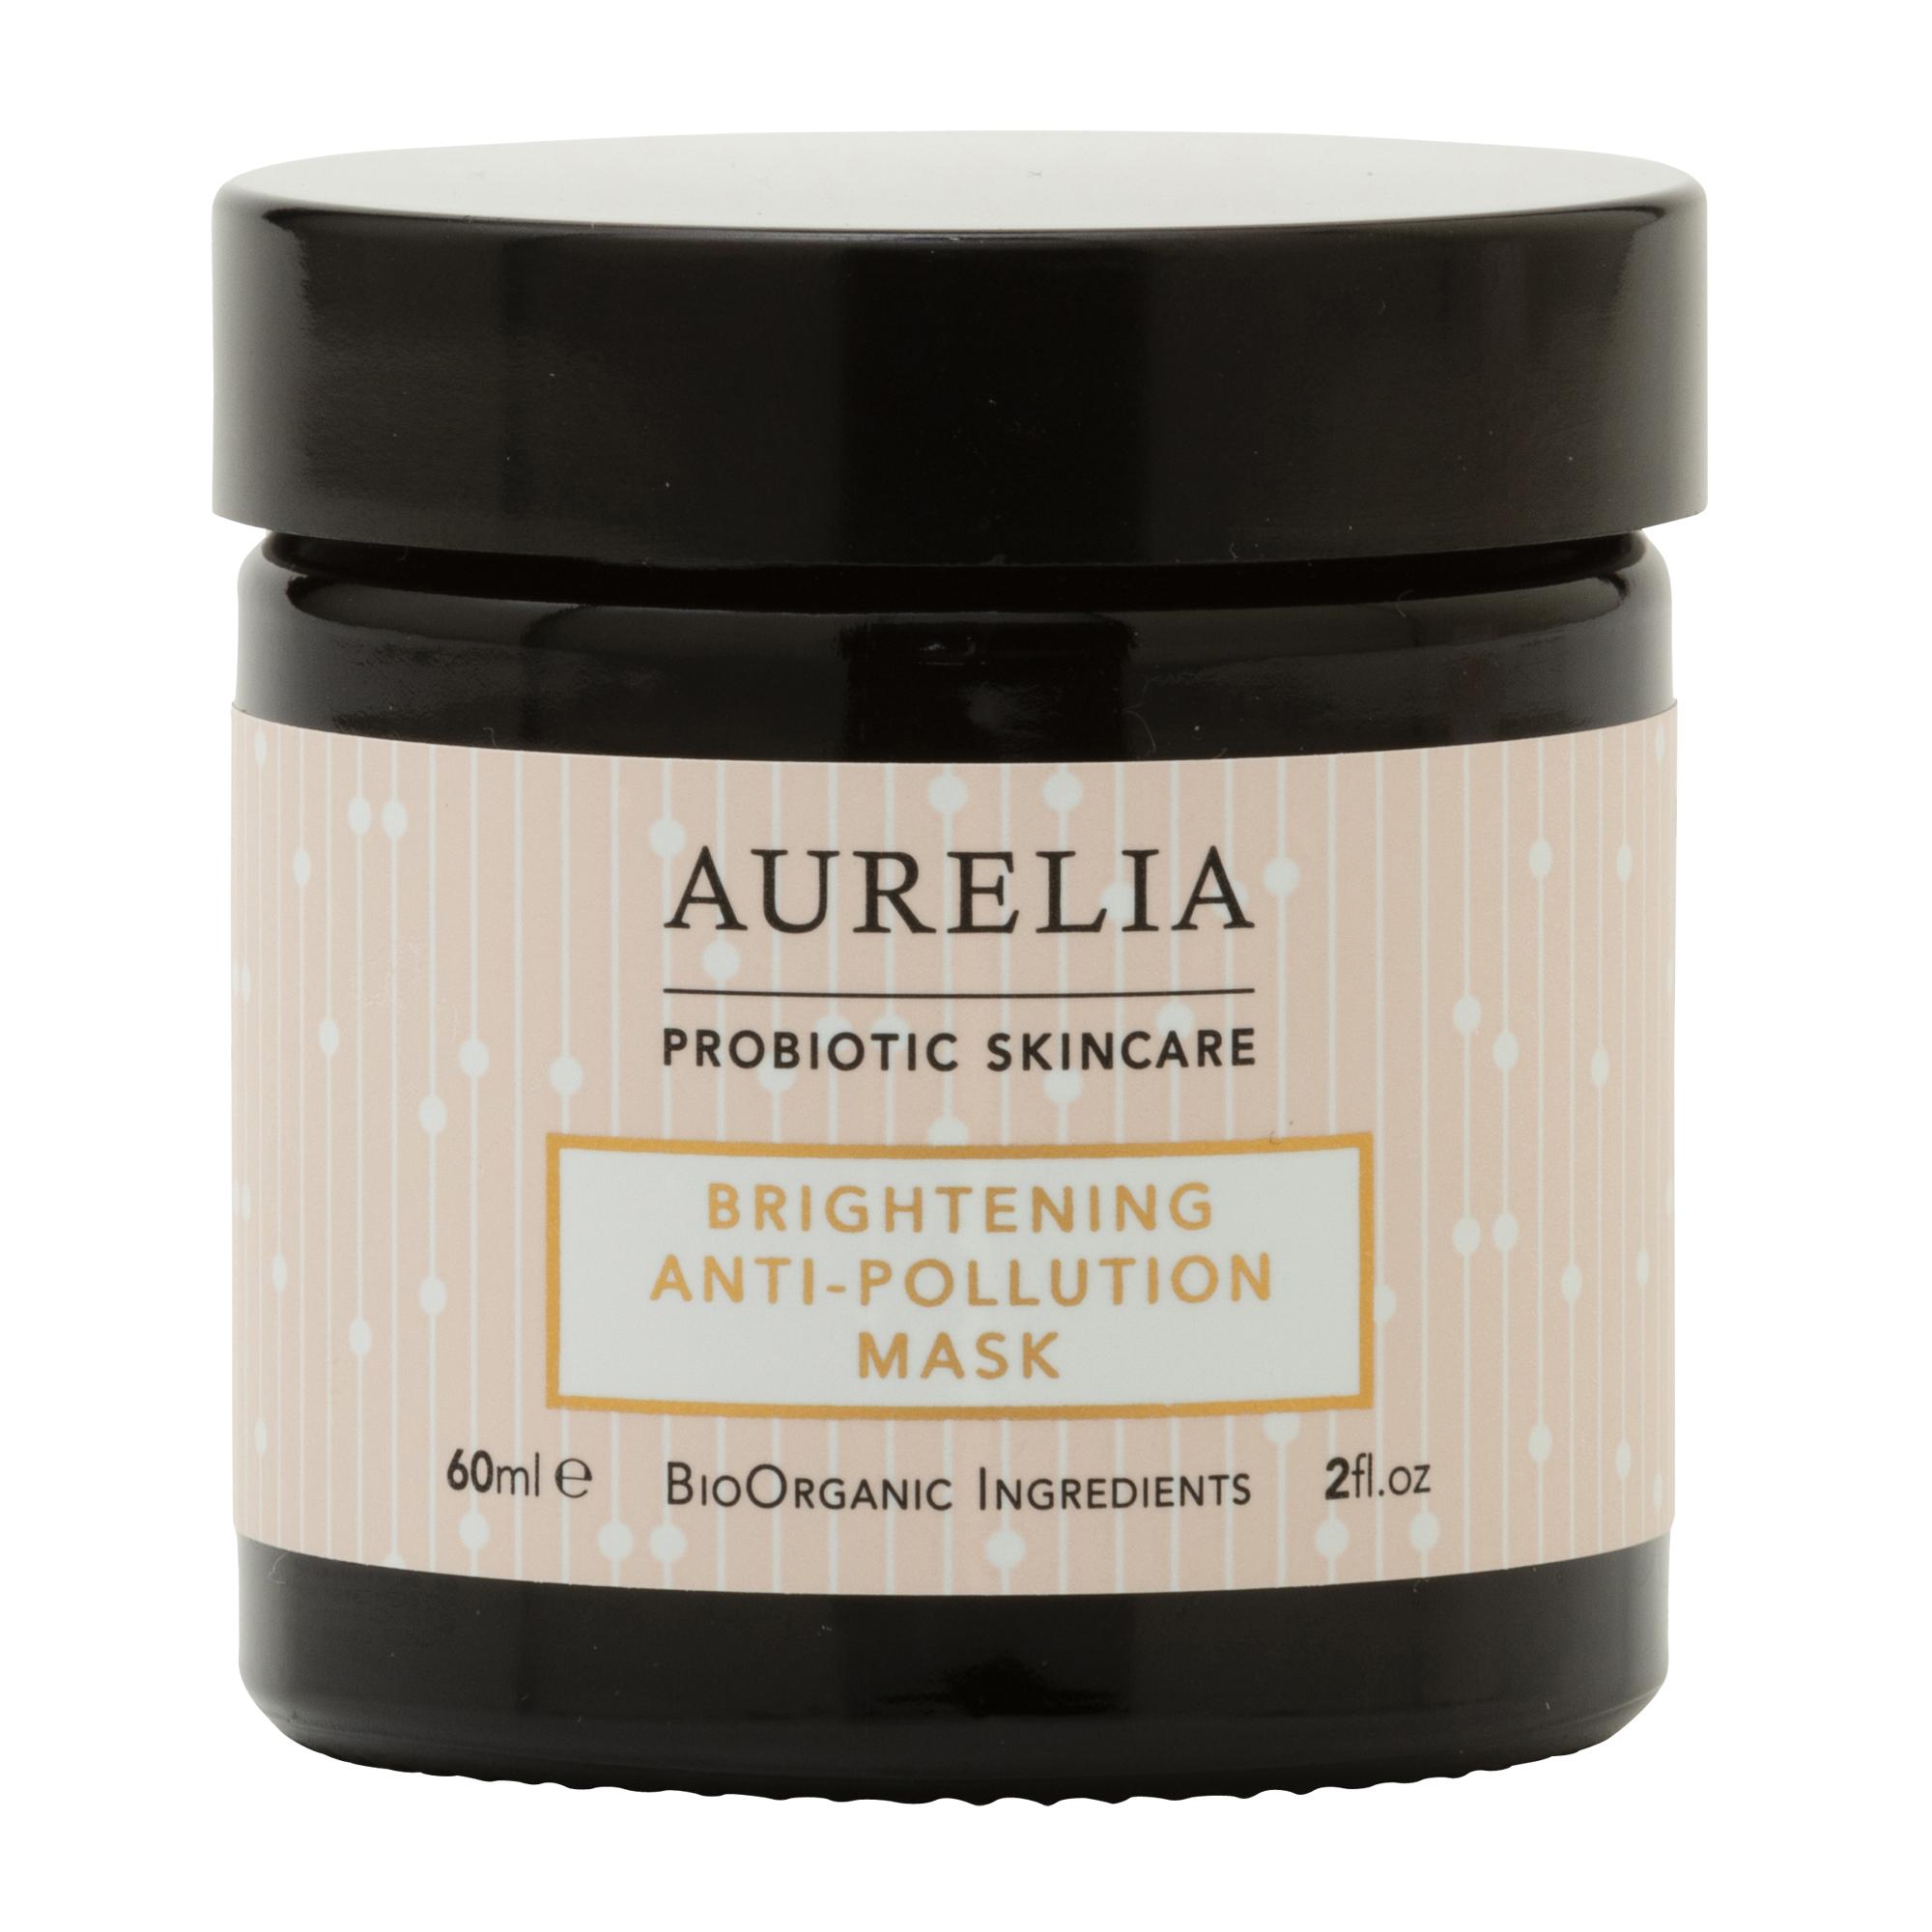 Aurelia Brightening Anti-Pollution Mask, 60 ml